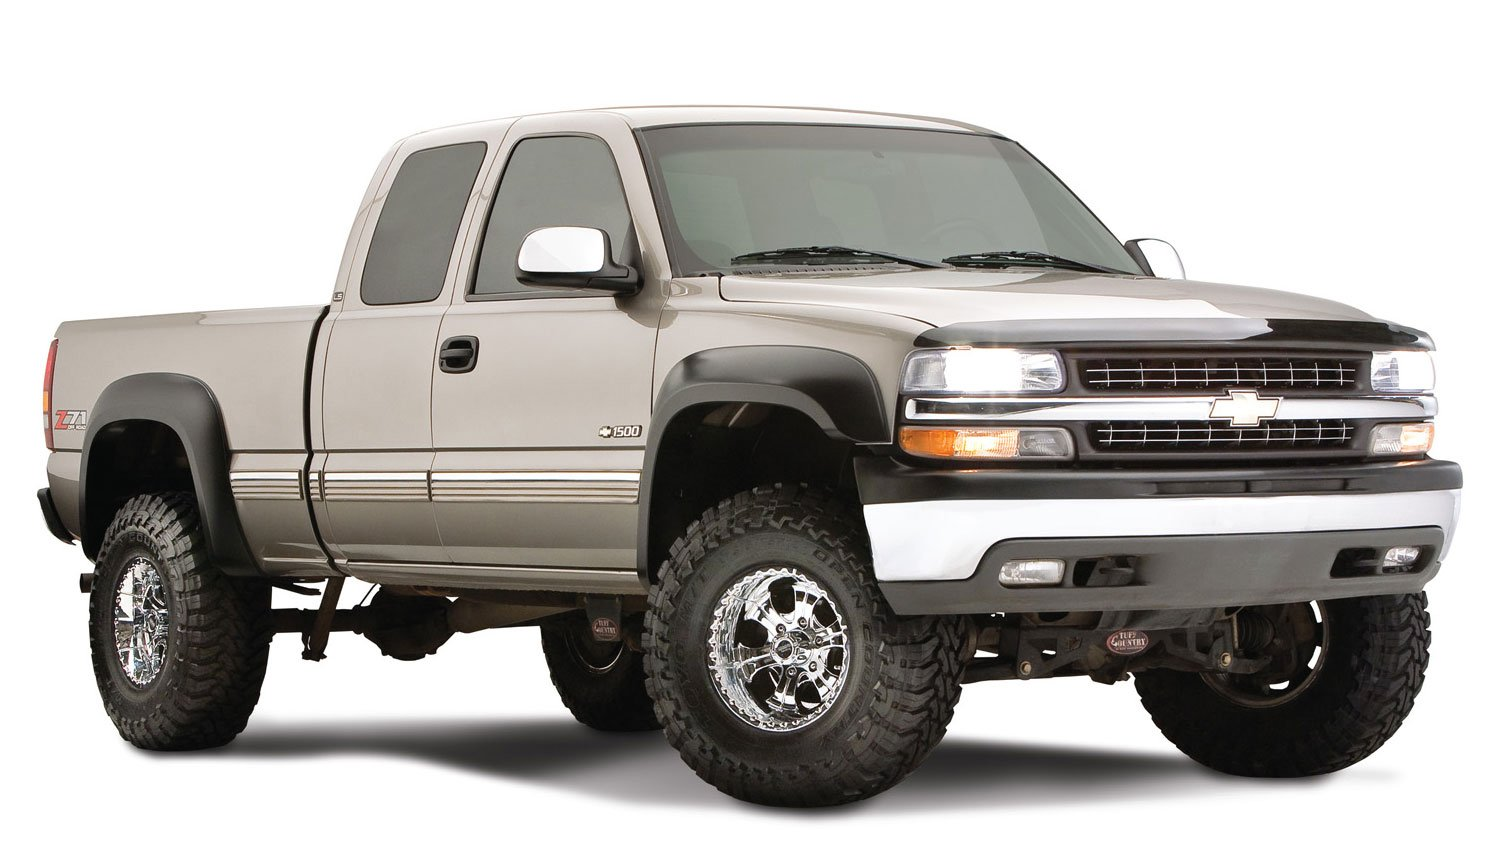 Bushwacker Chevrolet//GMC Extend-A-Fender Flare Set of 4